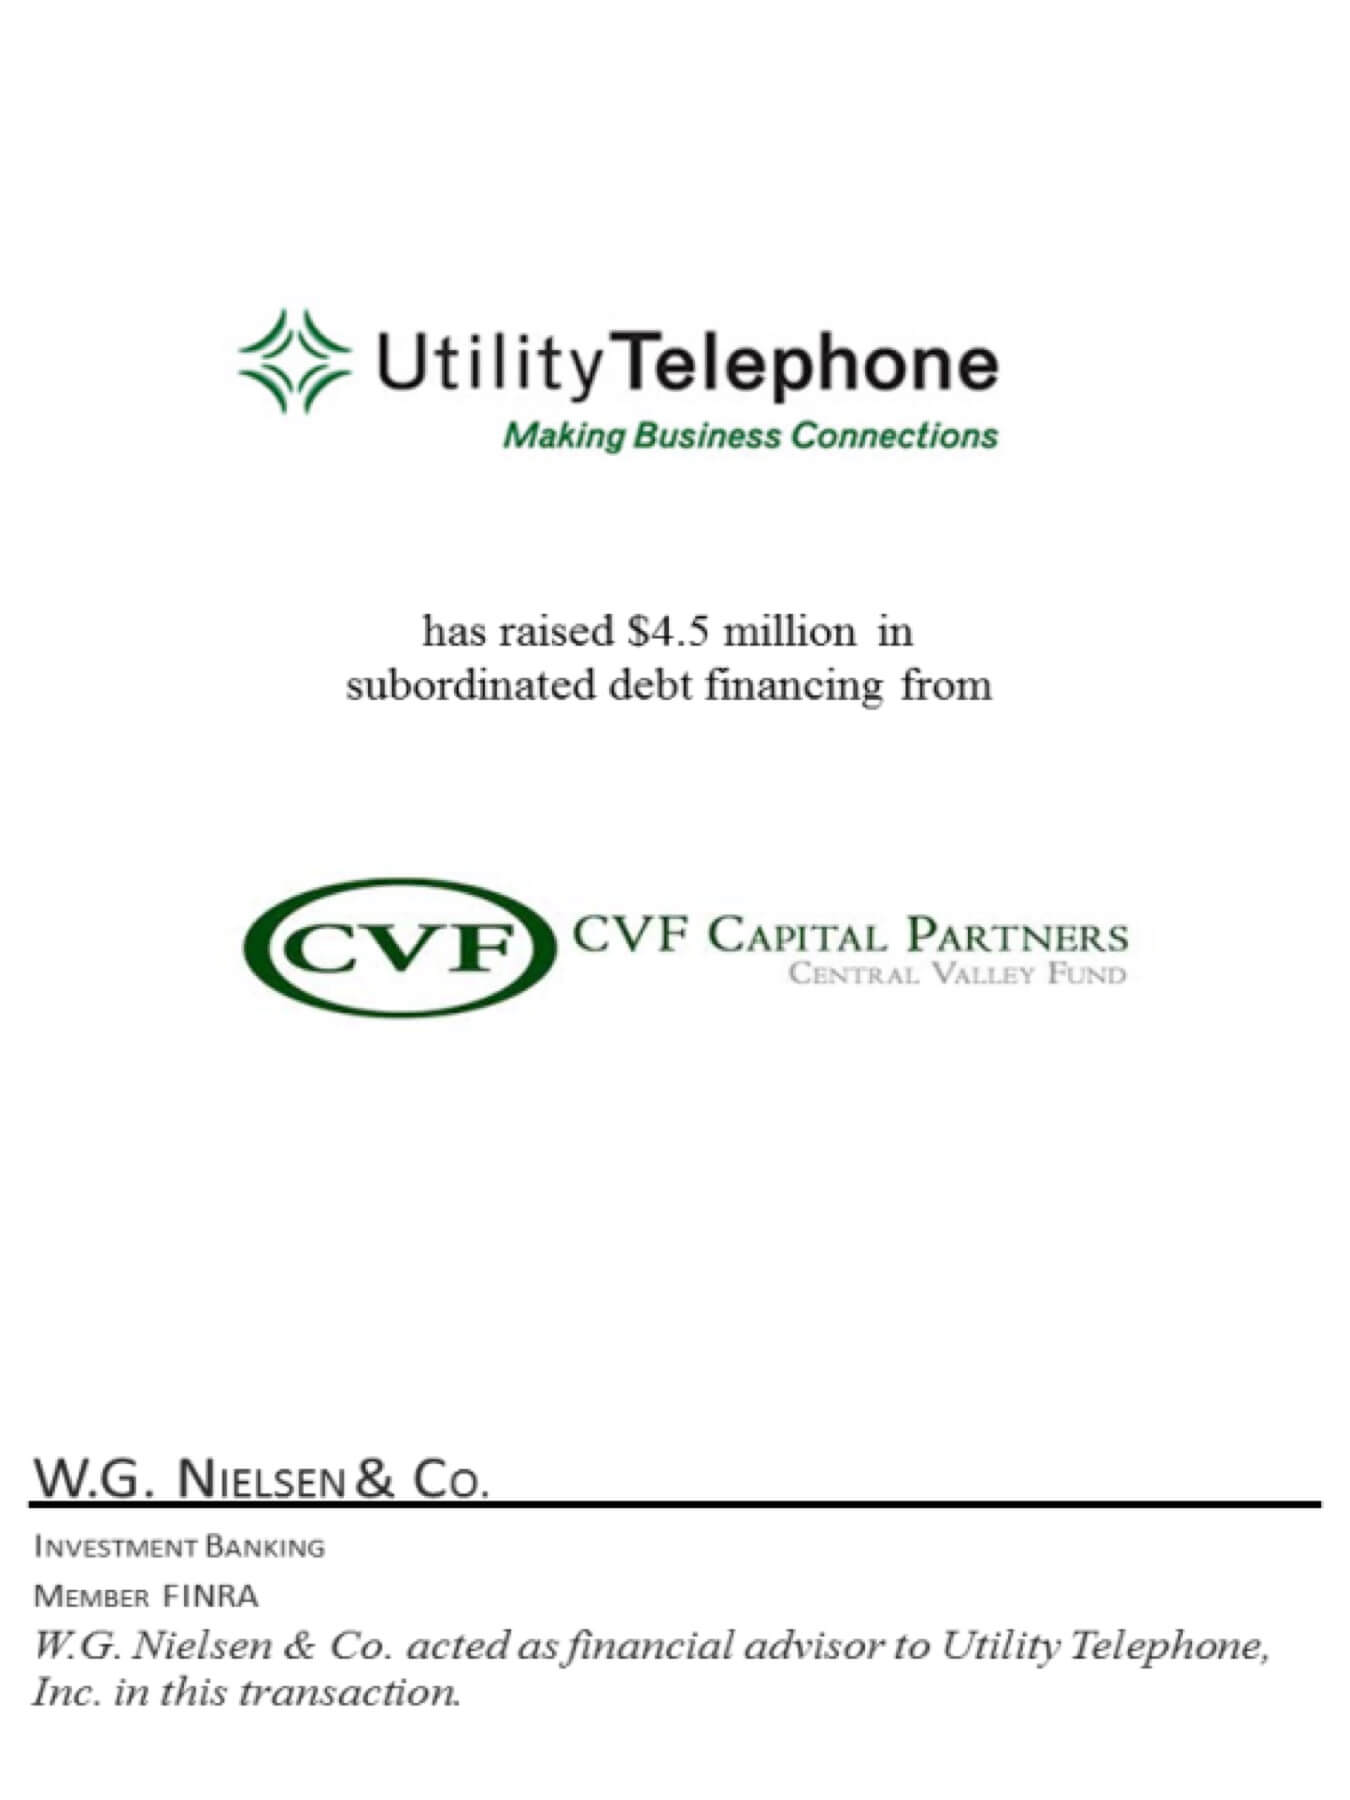 utility telephone 2 investment banking transaction